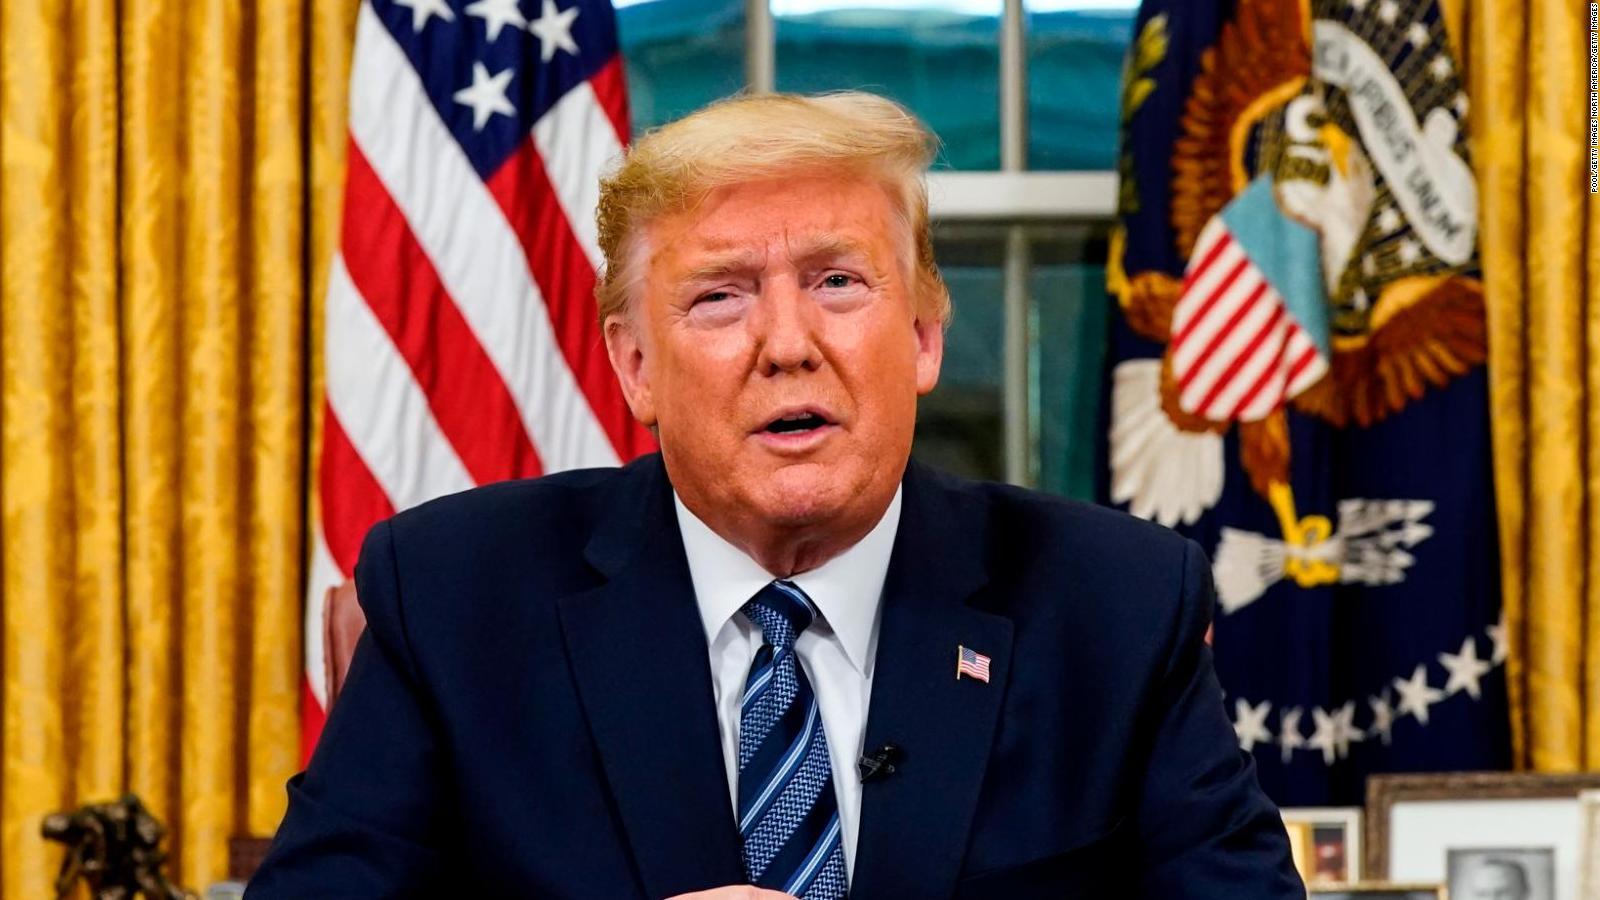 Coronavirus: Trump 'can't imagine why' U.S. disinfectant calls spiked